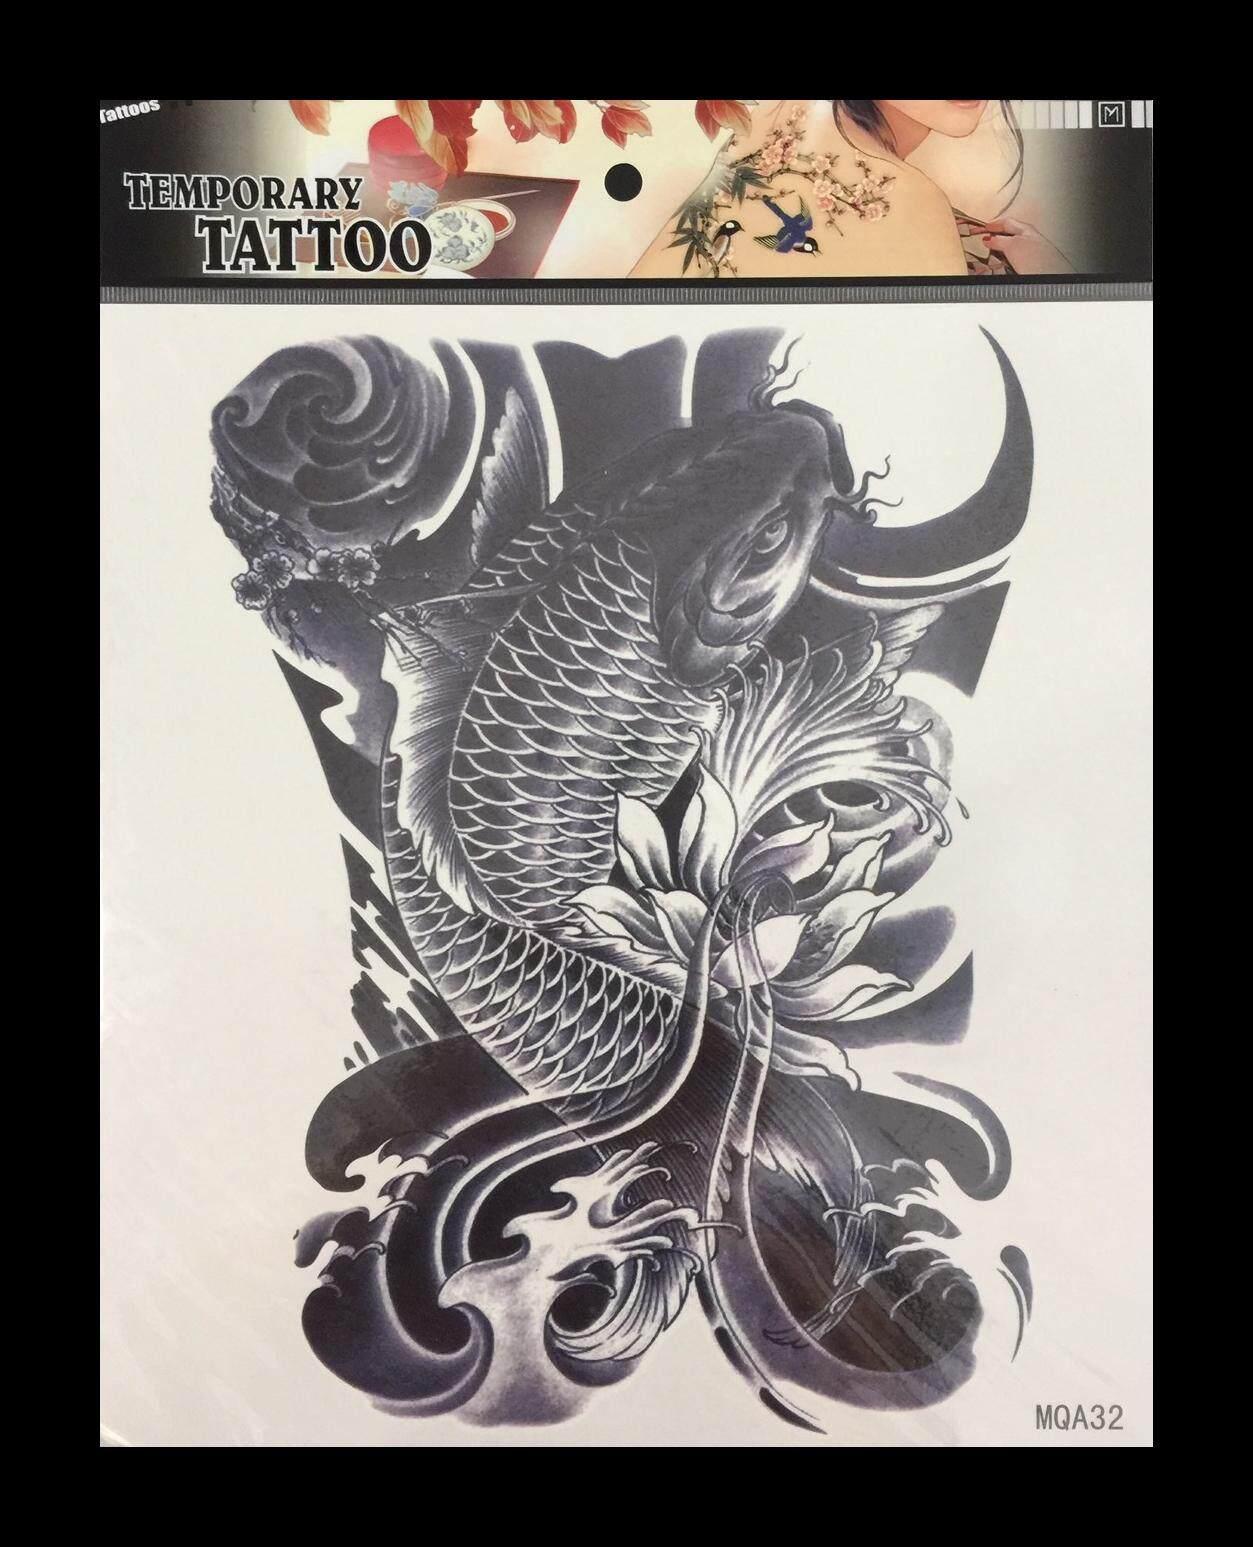 Temporary Tattoo Sticker สติ๊กเกอร์แทททู รอยสักชั่วคราว ลายปลา MQA-32 image